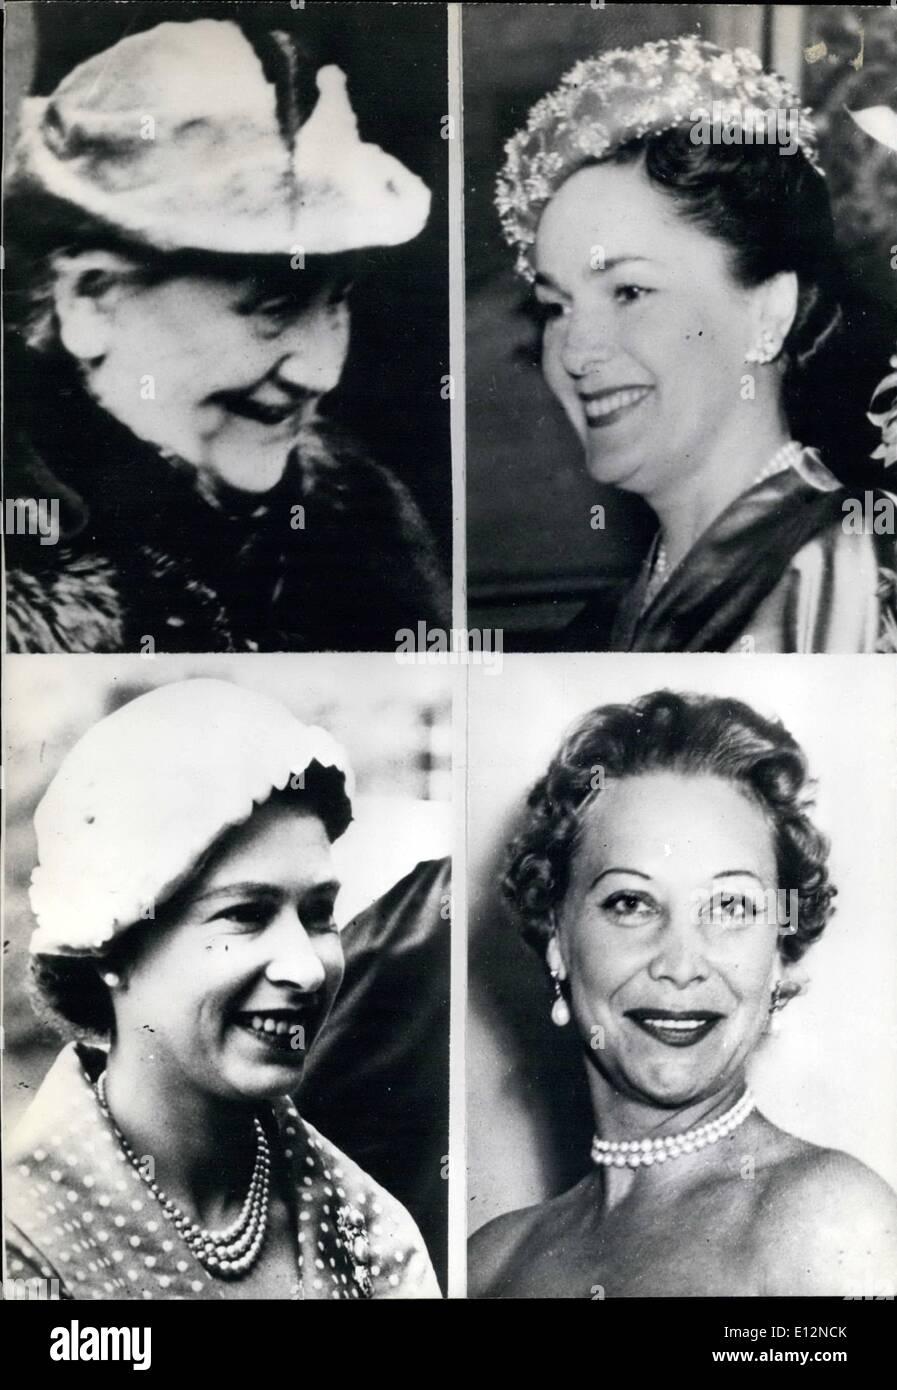 Feb. 24, 2012 - Top: Ex-Queen Wilhelmina of Holland, Begum Om Habibeh Aga Khan. Bottom: Queen Elizabeth II of England, Suzanne Volterra. - Stock Image